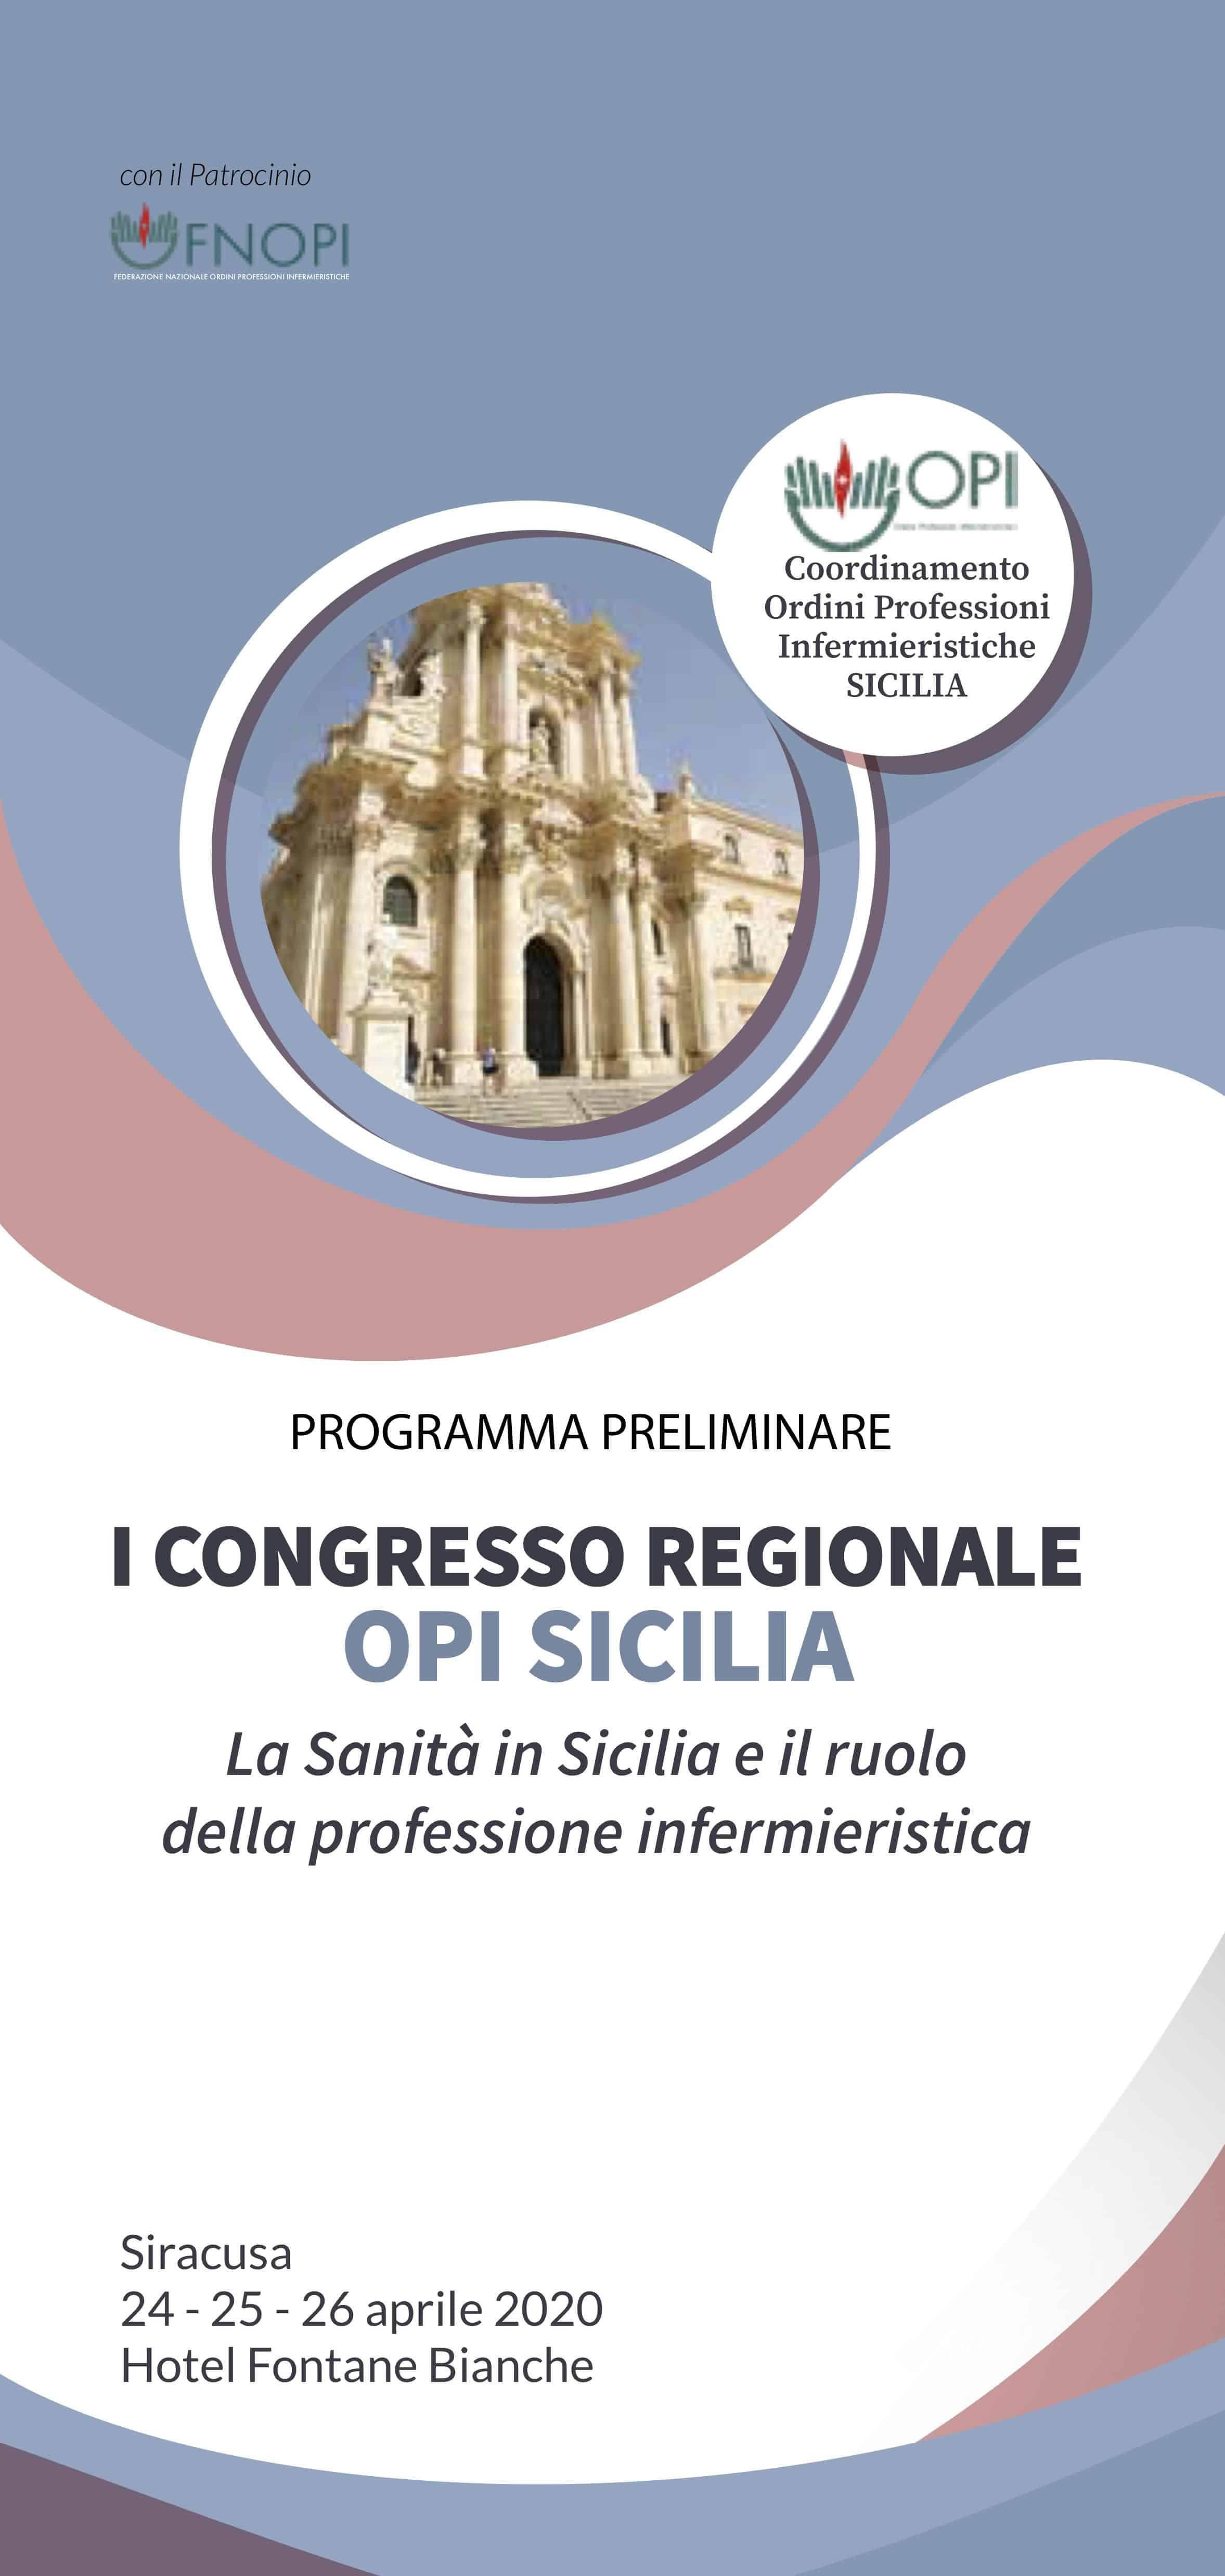 congesso opi sicilia 2020